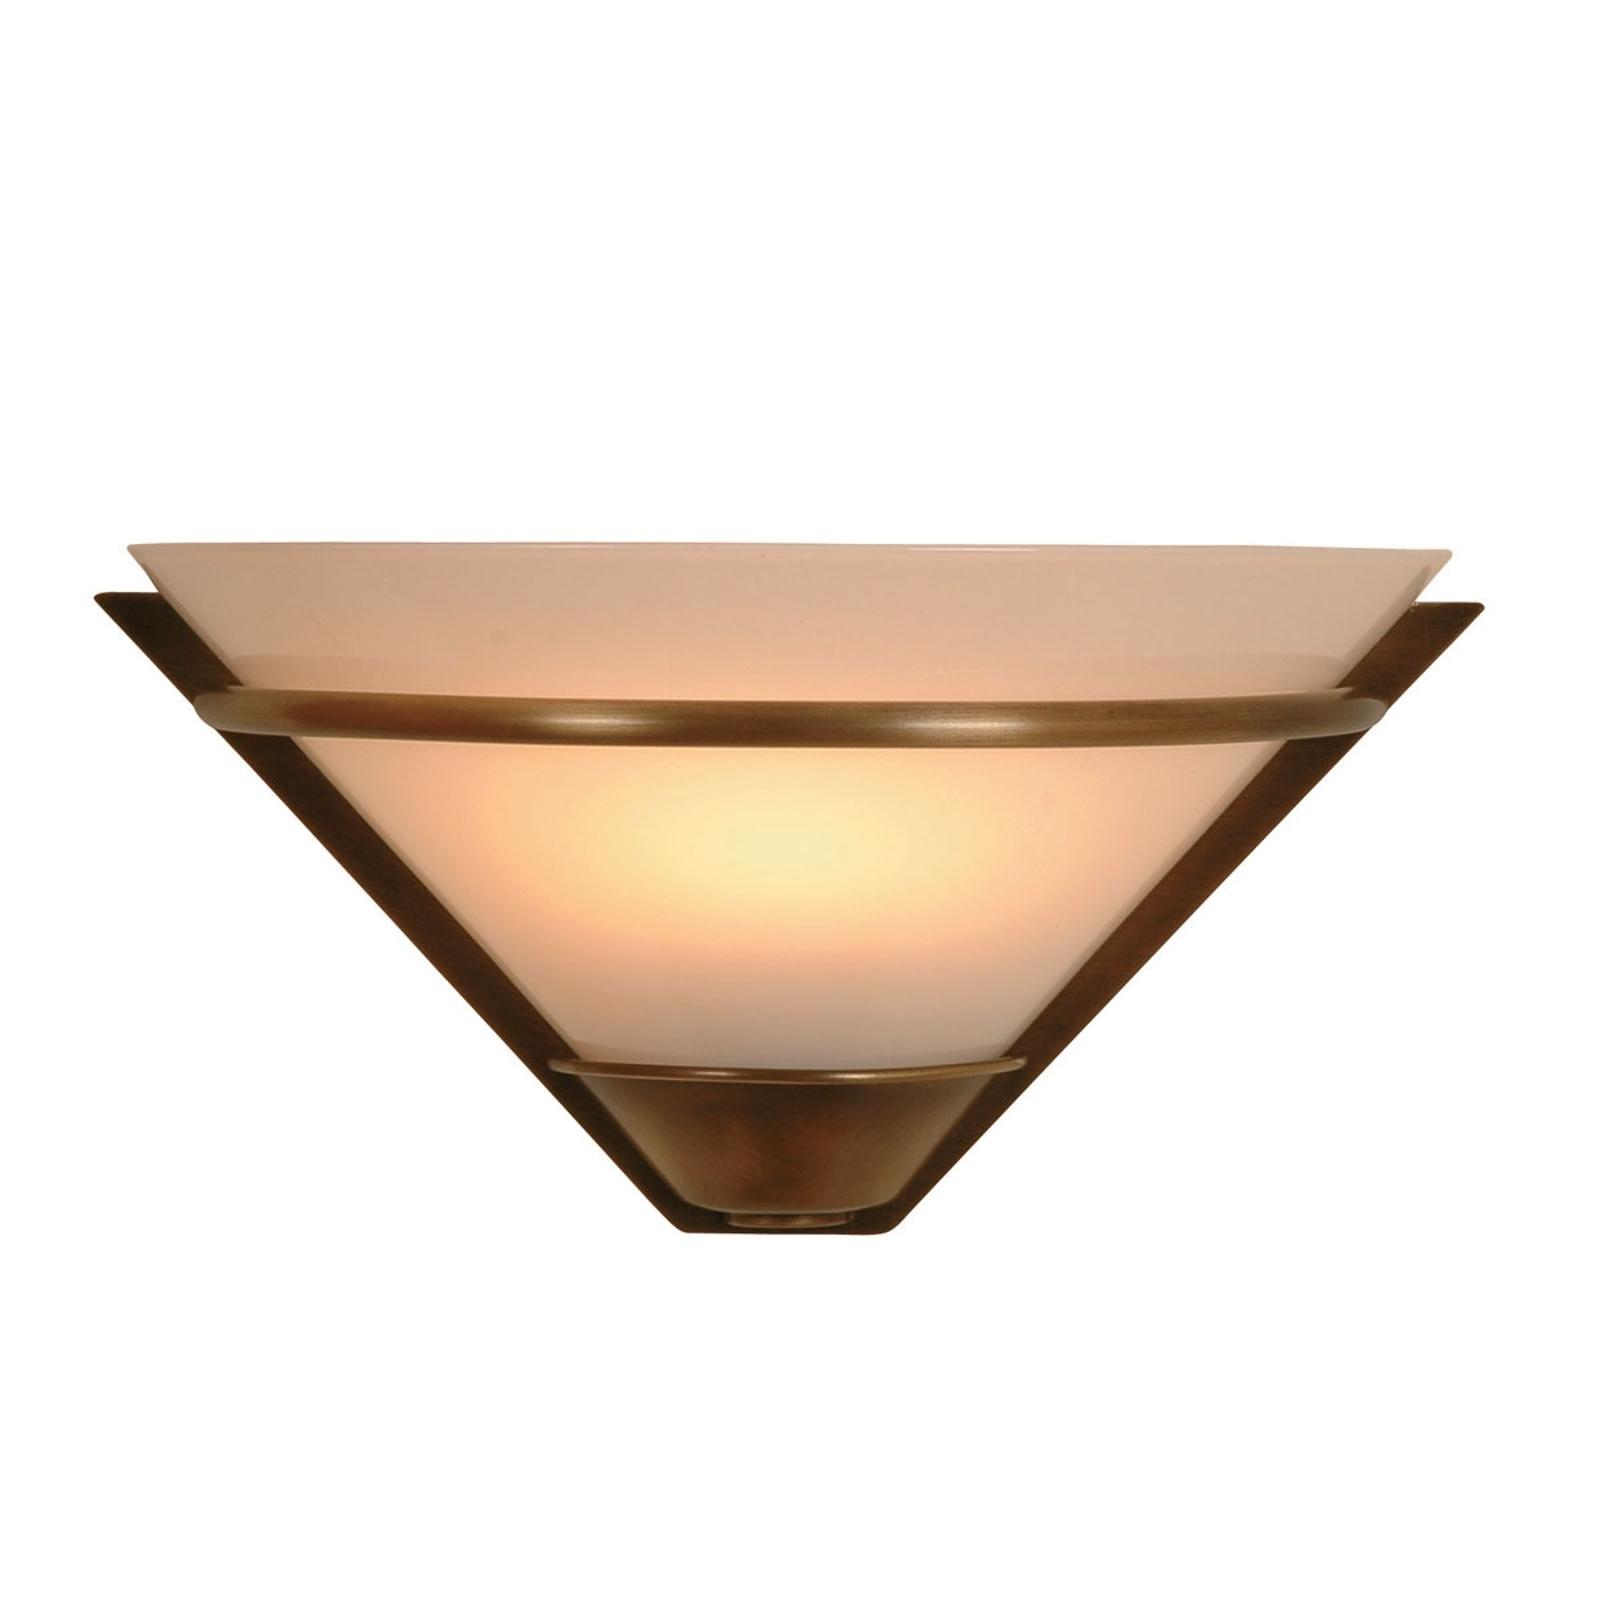 Vegguplight ANNO 1900 med opalglass,polert messing